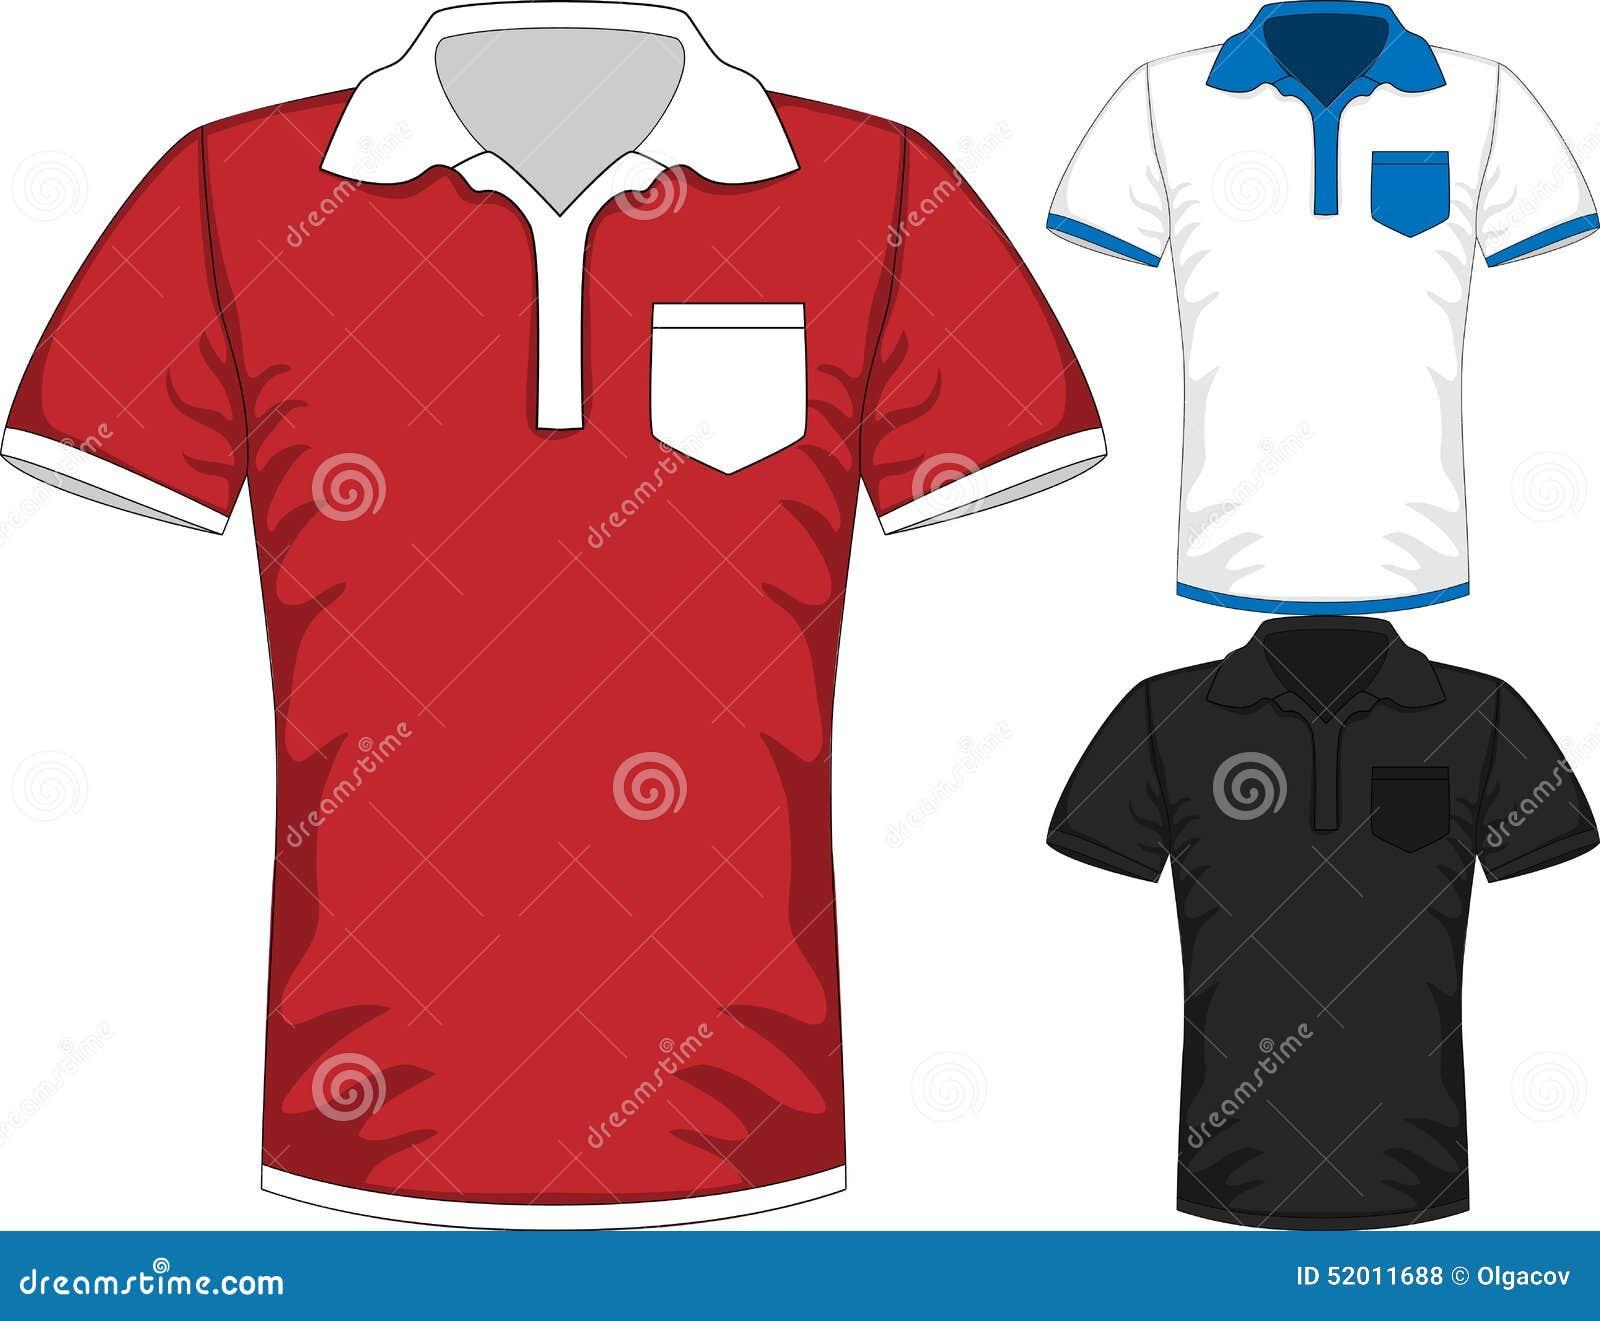 Shirt design red - Vector Mens Short Sleeve T Shirt Polo Design Royalty Free Stock Photos